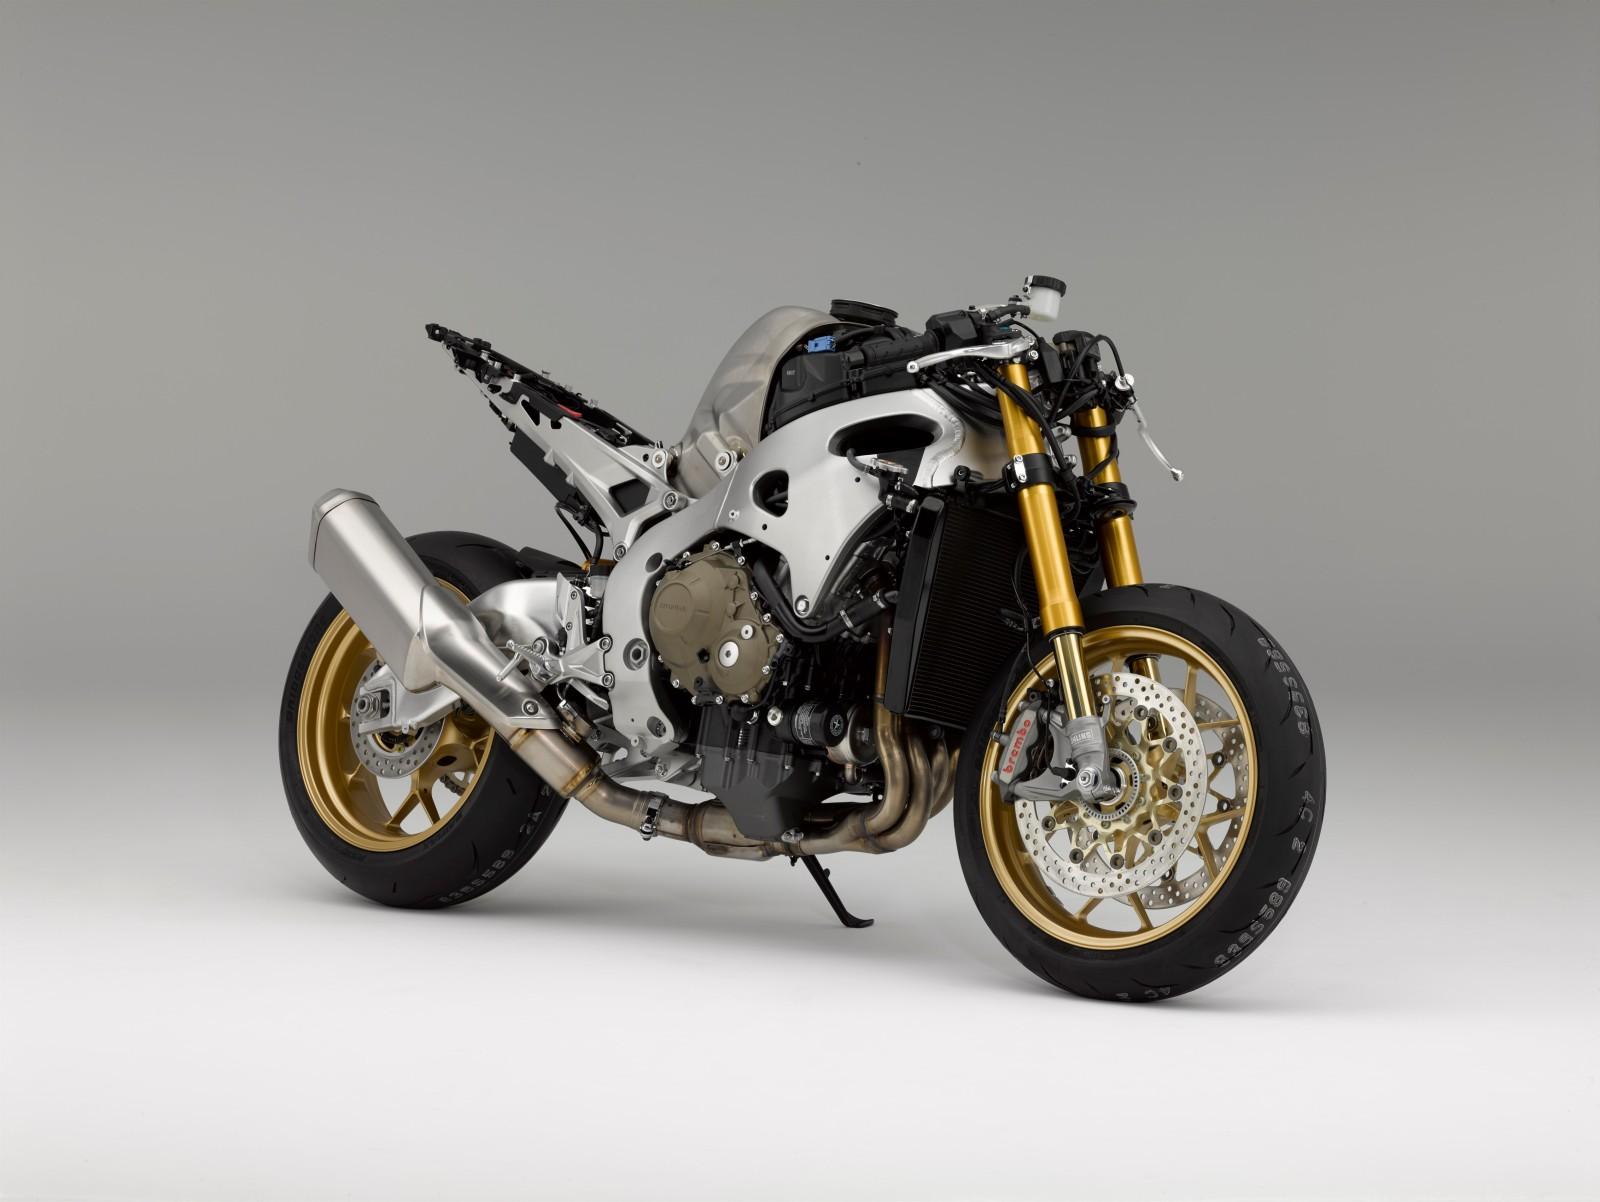 MY17-Honda-CBR1000RR-Fireblade-SP-6